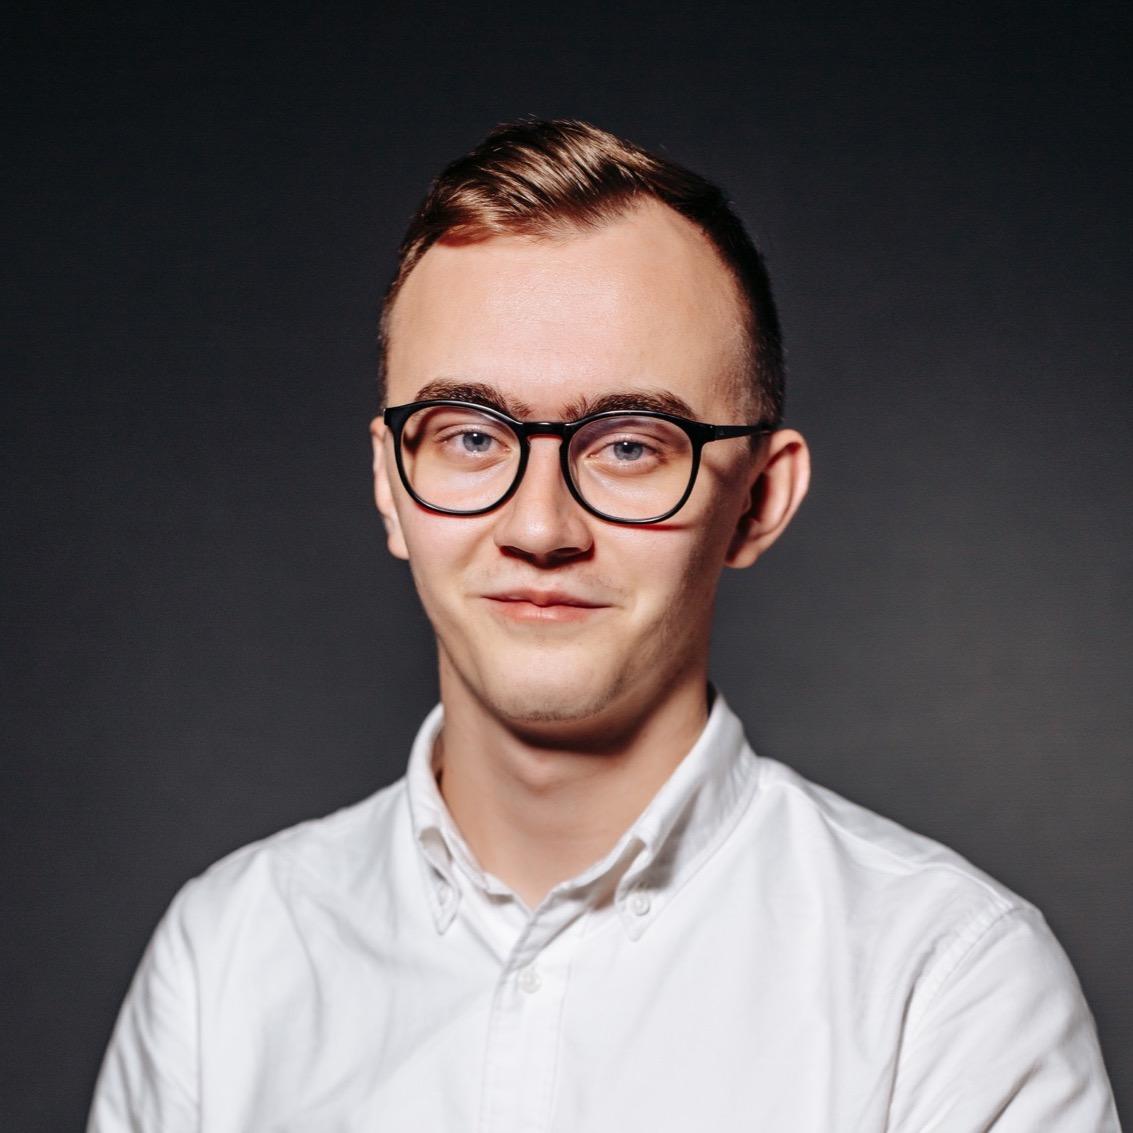 Директор Открытой лиги КВН МГПУ Дмитрий Шишкунов